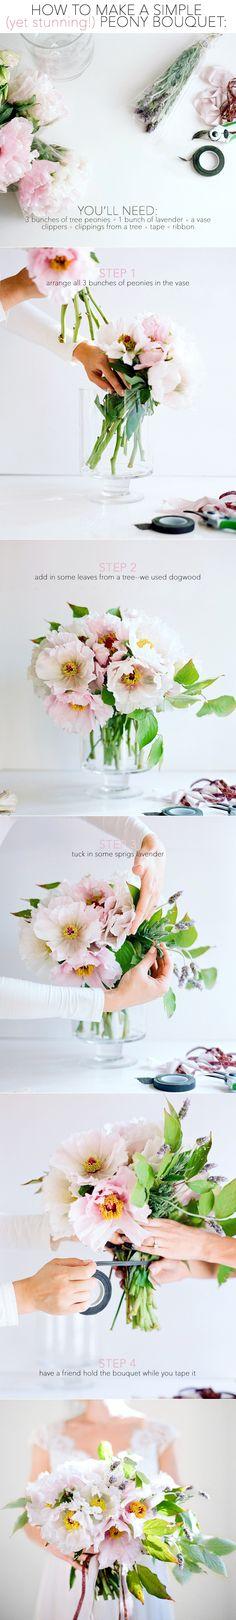 diy wedding peony bouquet tutorial via once wed